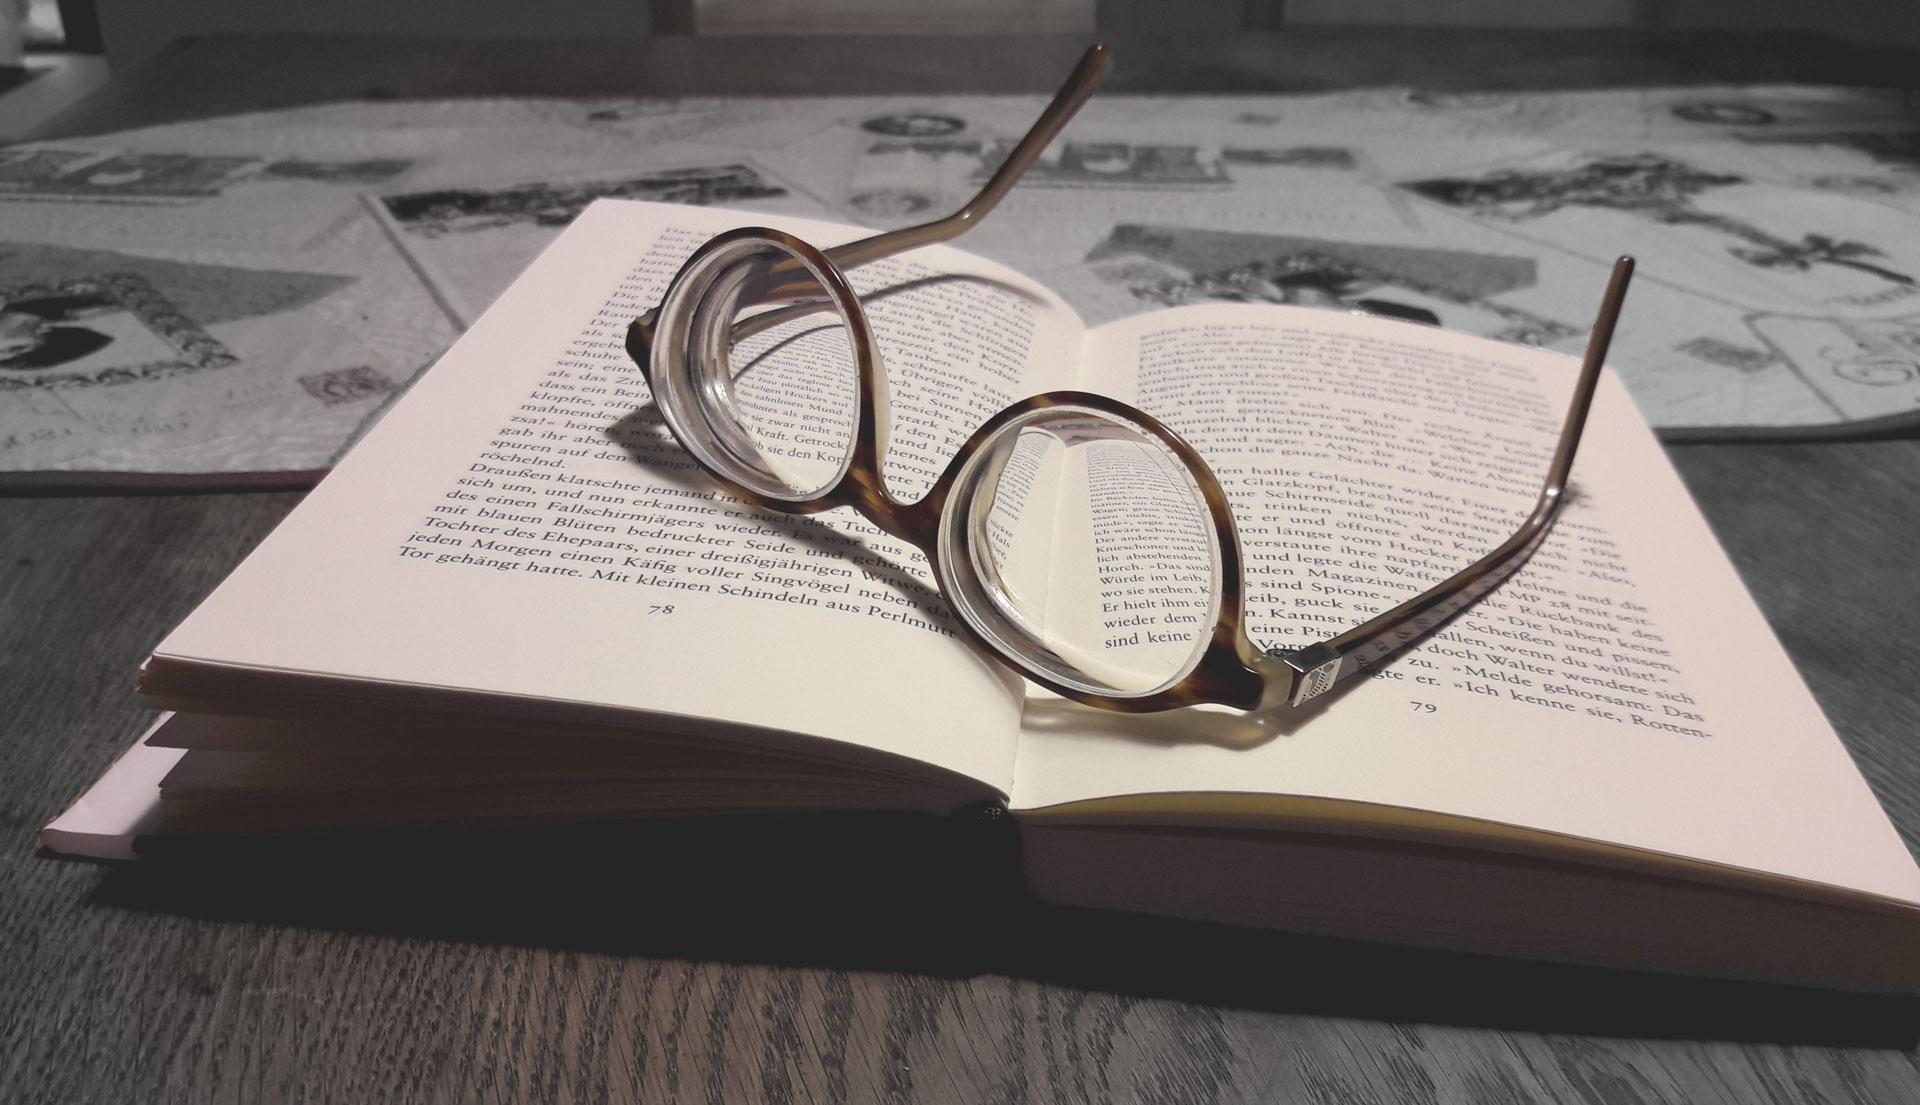 Gambar Penulisan Book Baca Baca Bacaan Halaman Buku